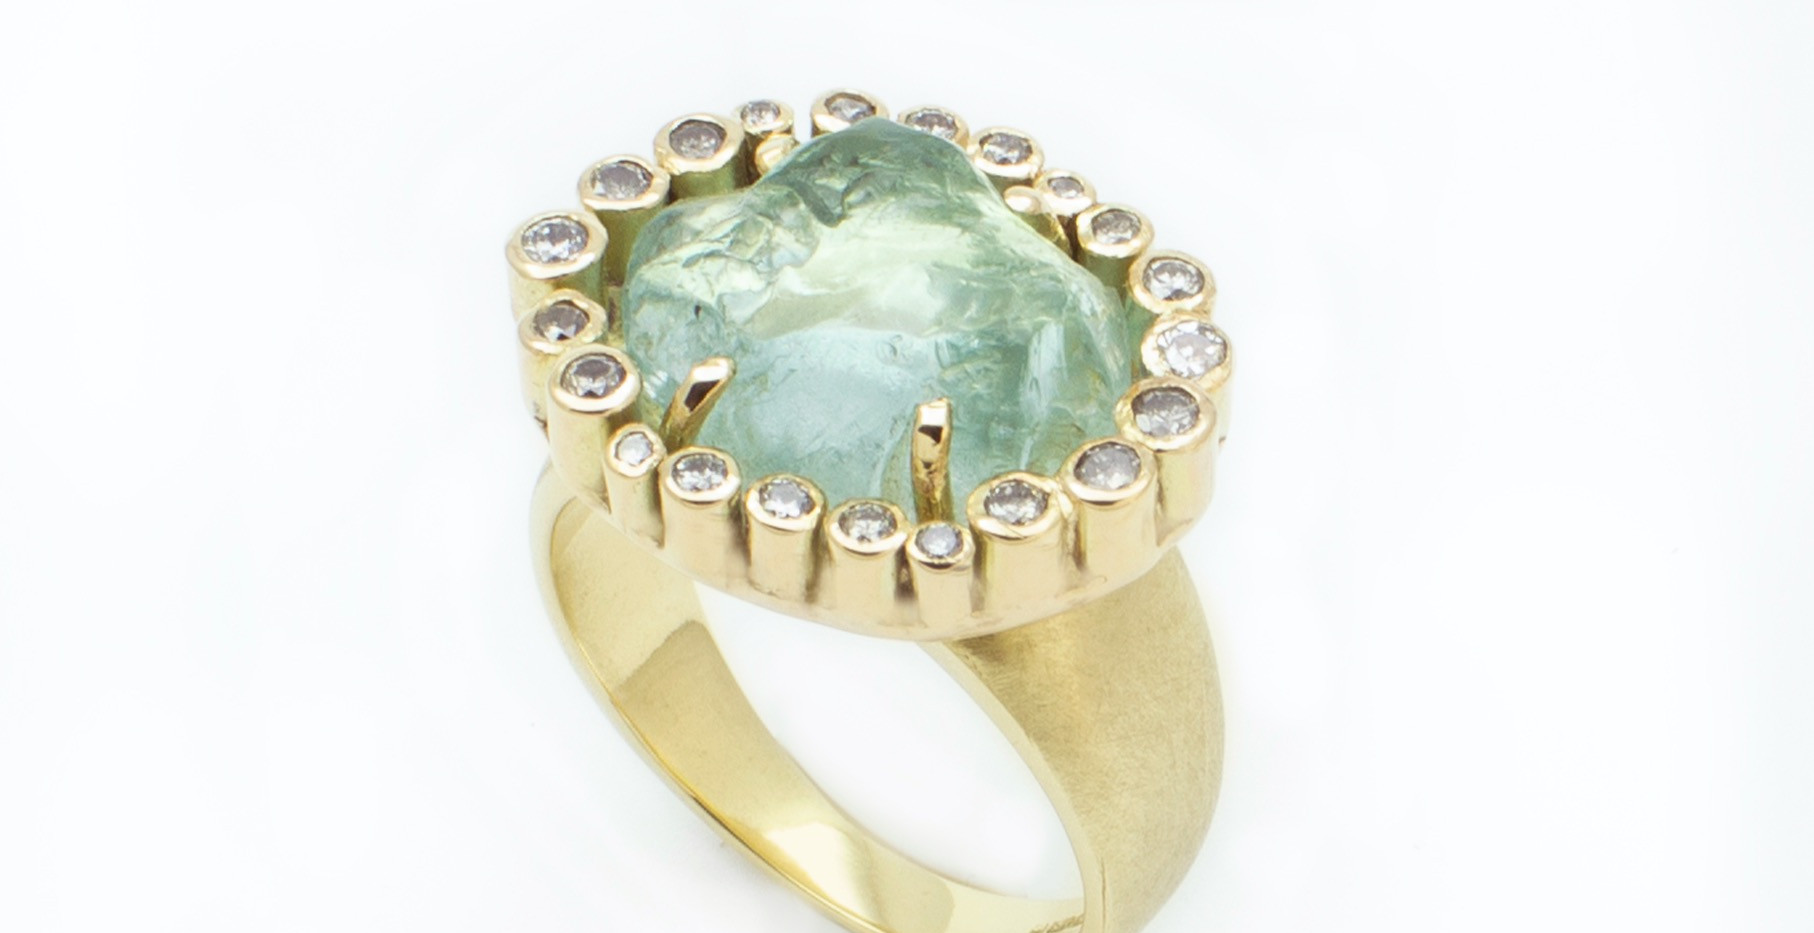 Glacier ring